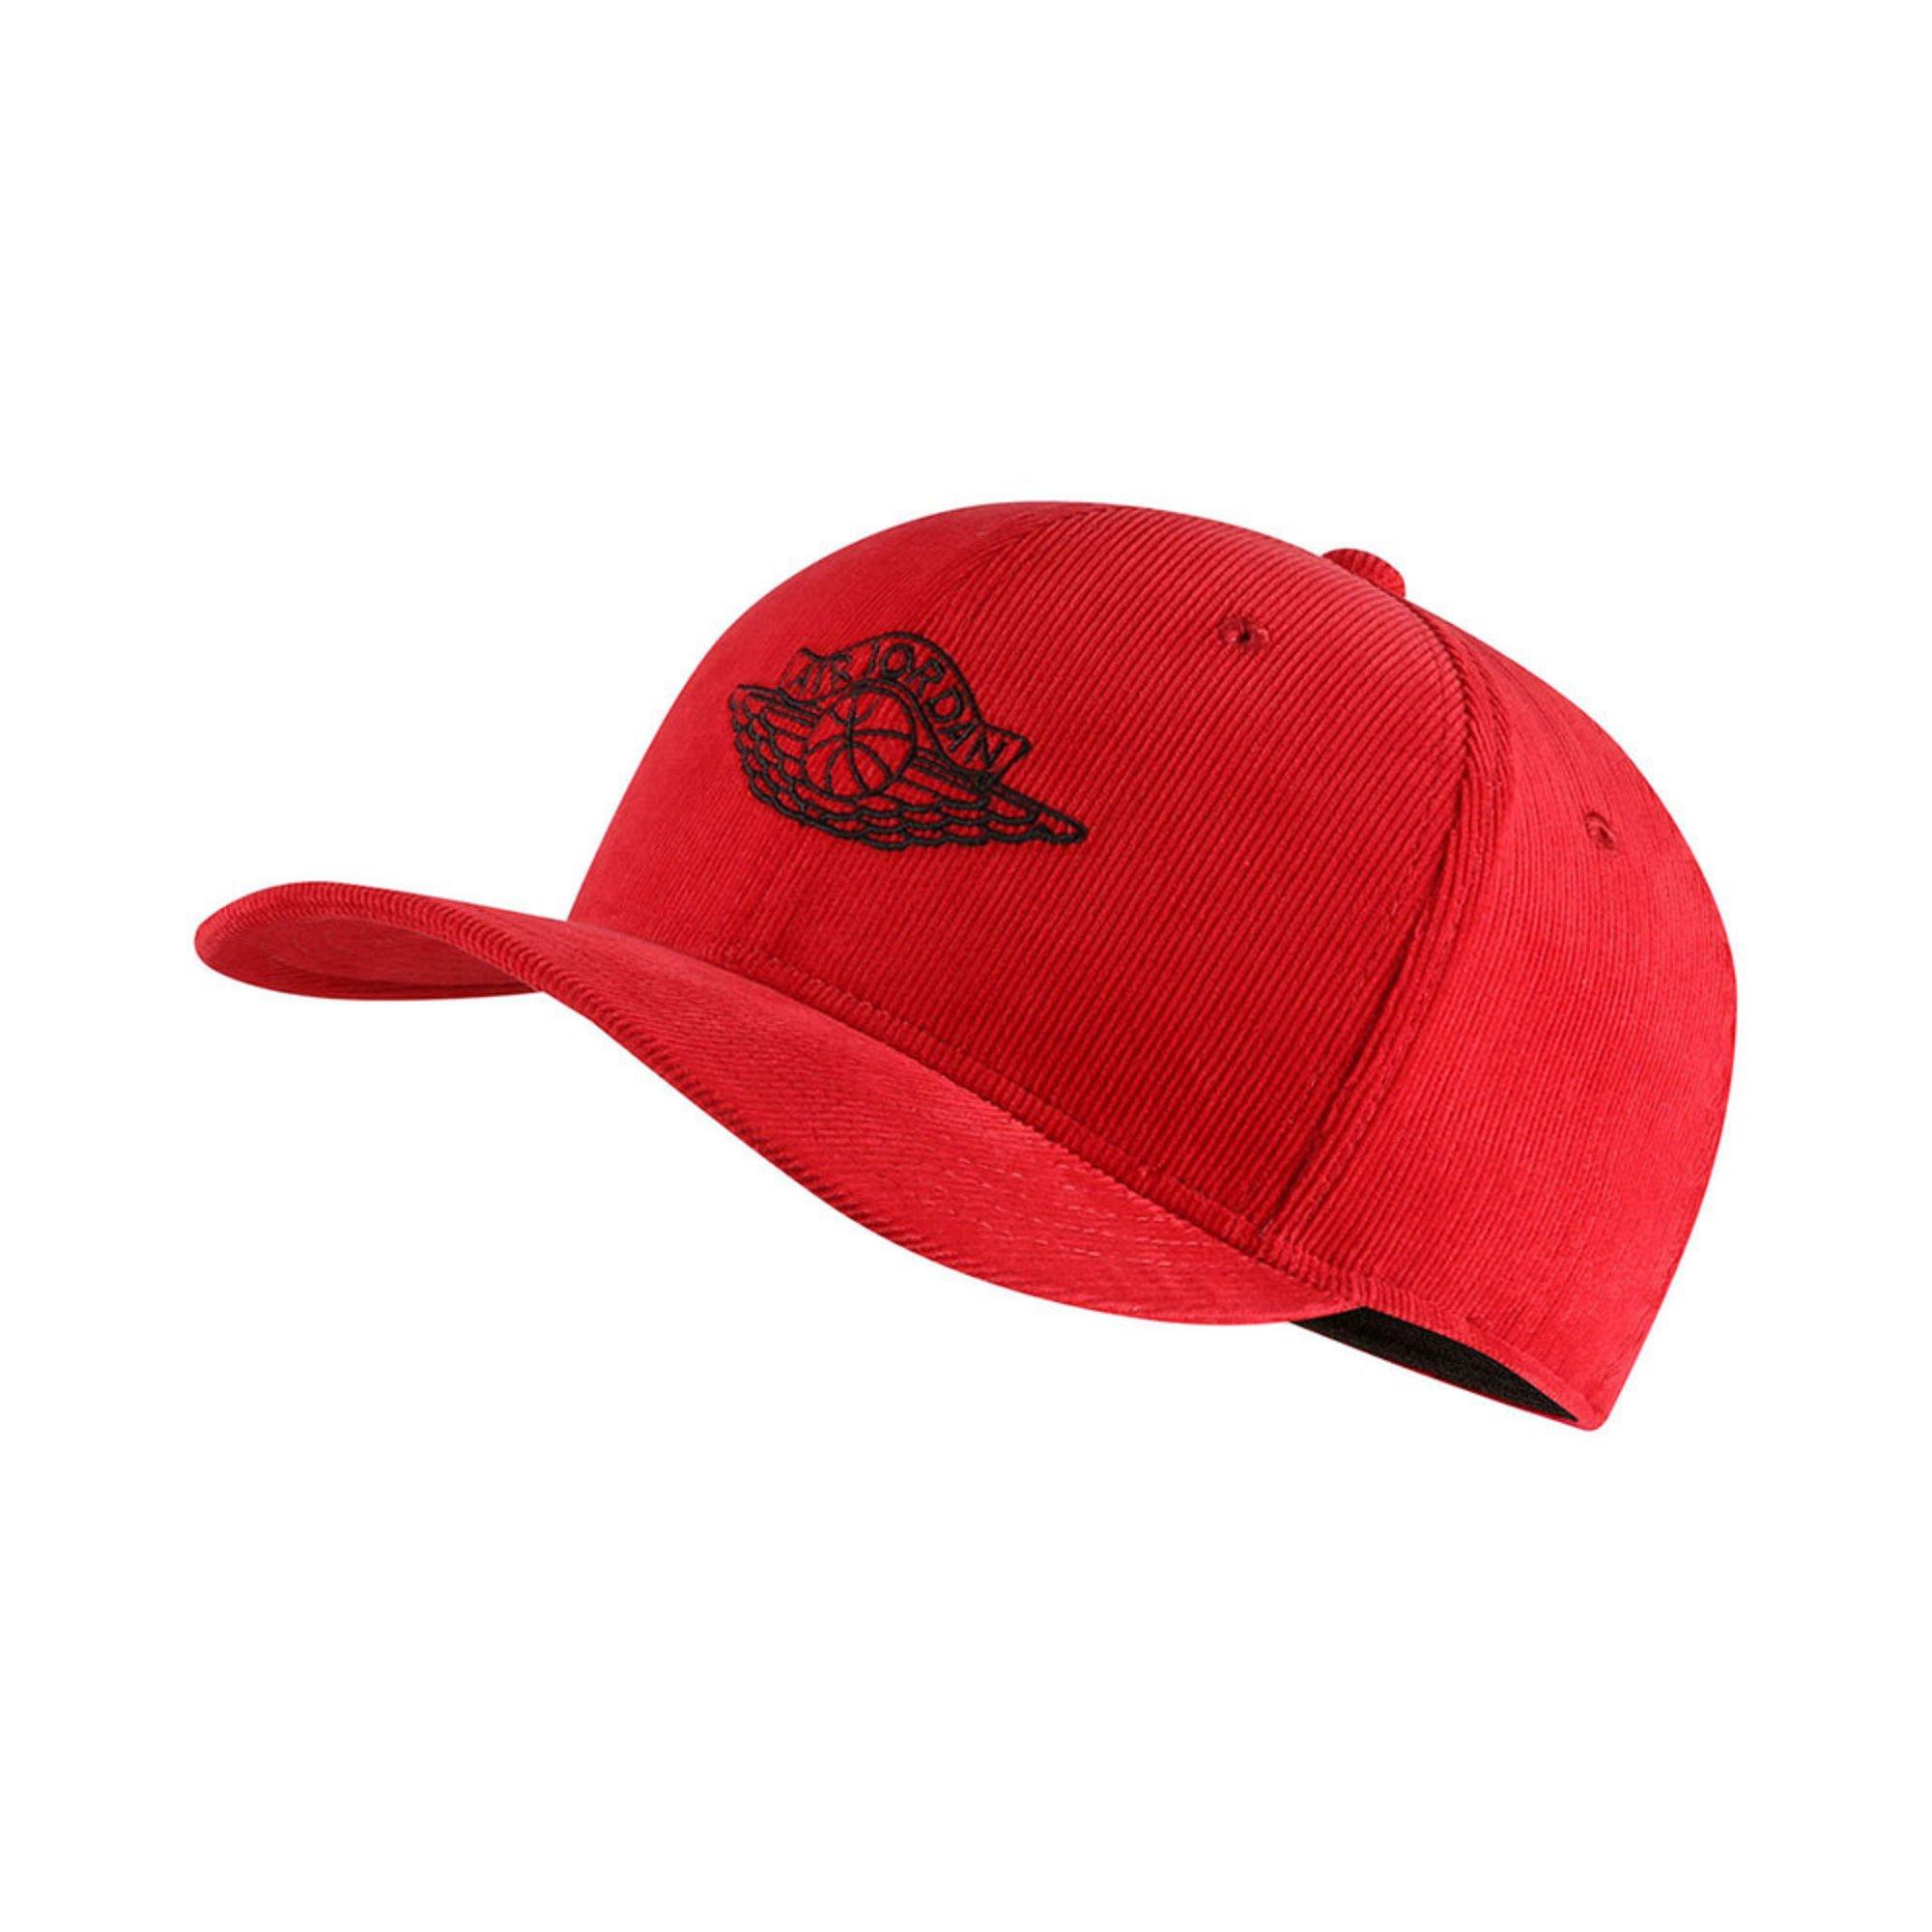 9af2f61f13a7f0 Jordan Men's Wings Hat | Active Hats & Beanies | Apparel - Shop Your ...